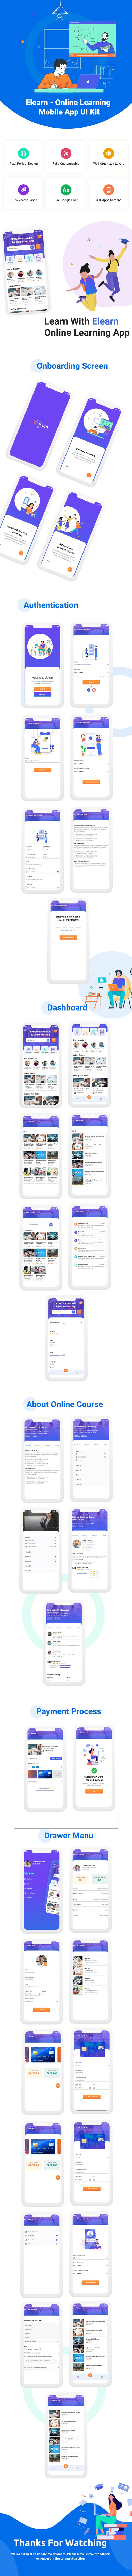 Elearn - Online Learning Mobile App UI Kit - 2